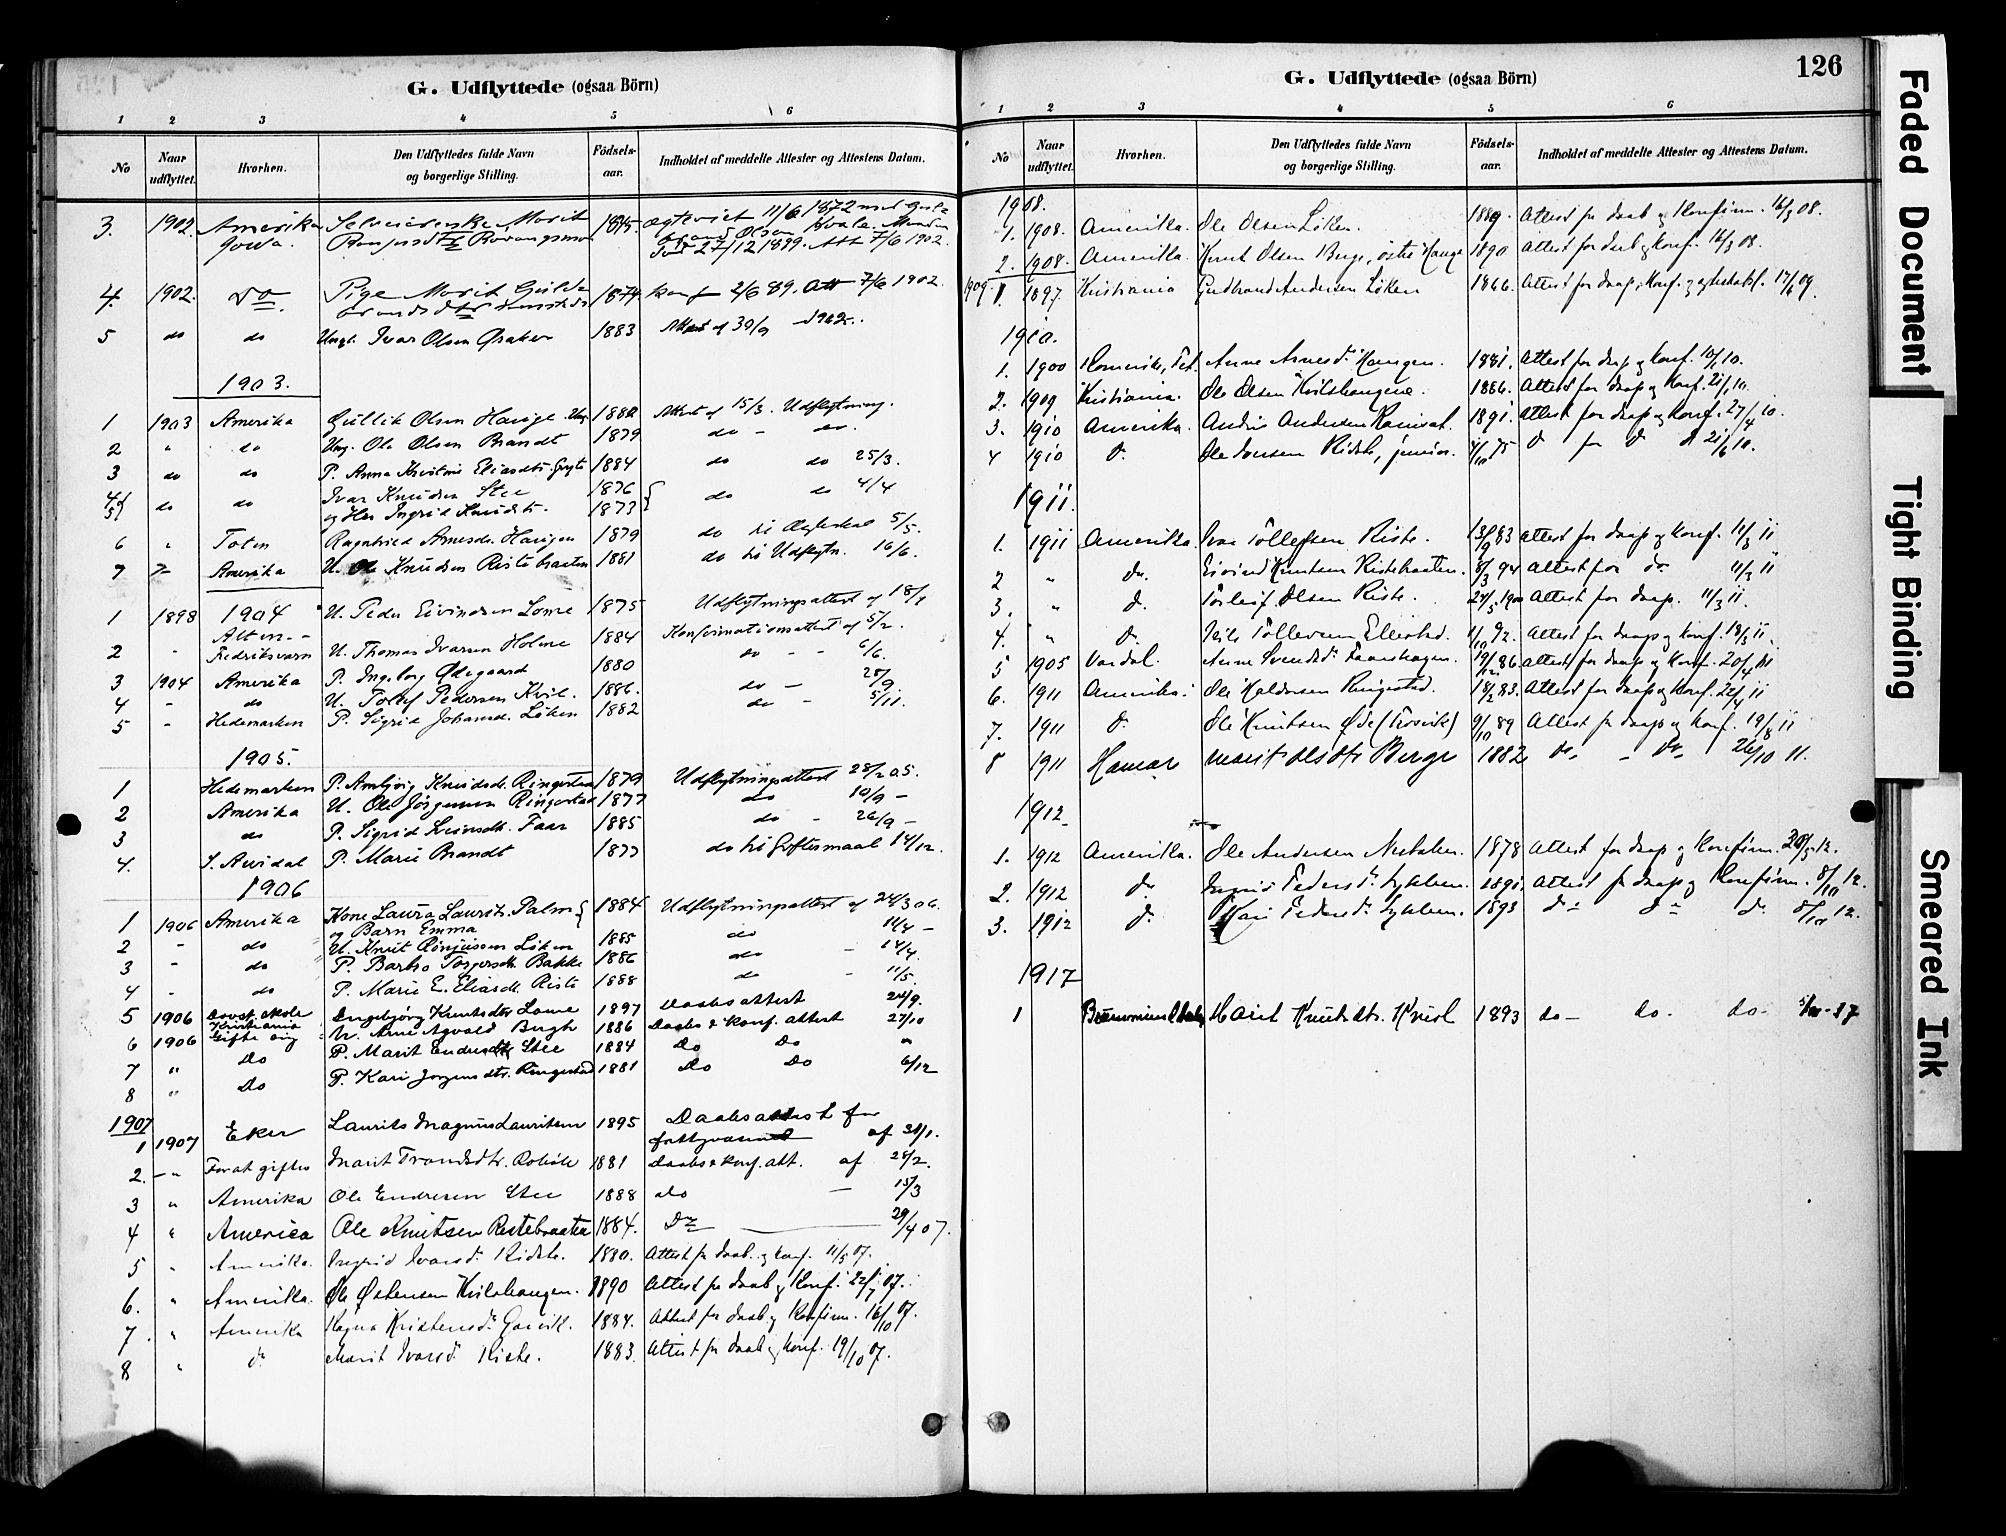 SAH, Vestre Slidre prestekontor, Ministerialbok nr. 5, 1881-1912, s. 126